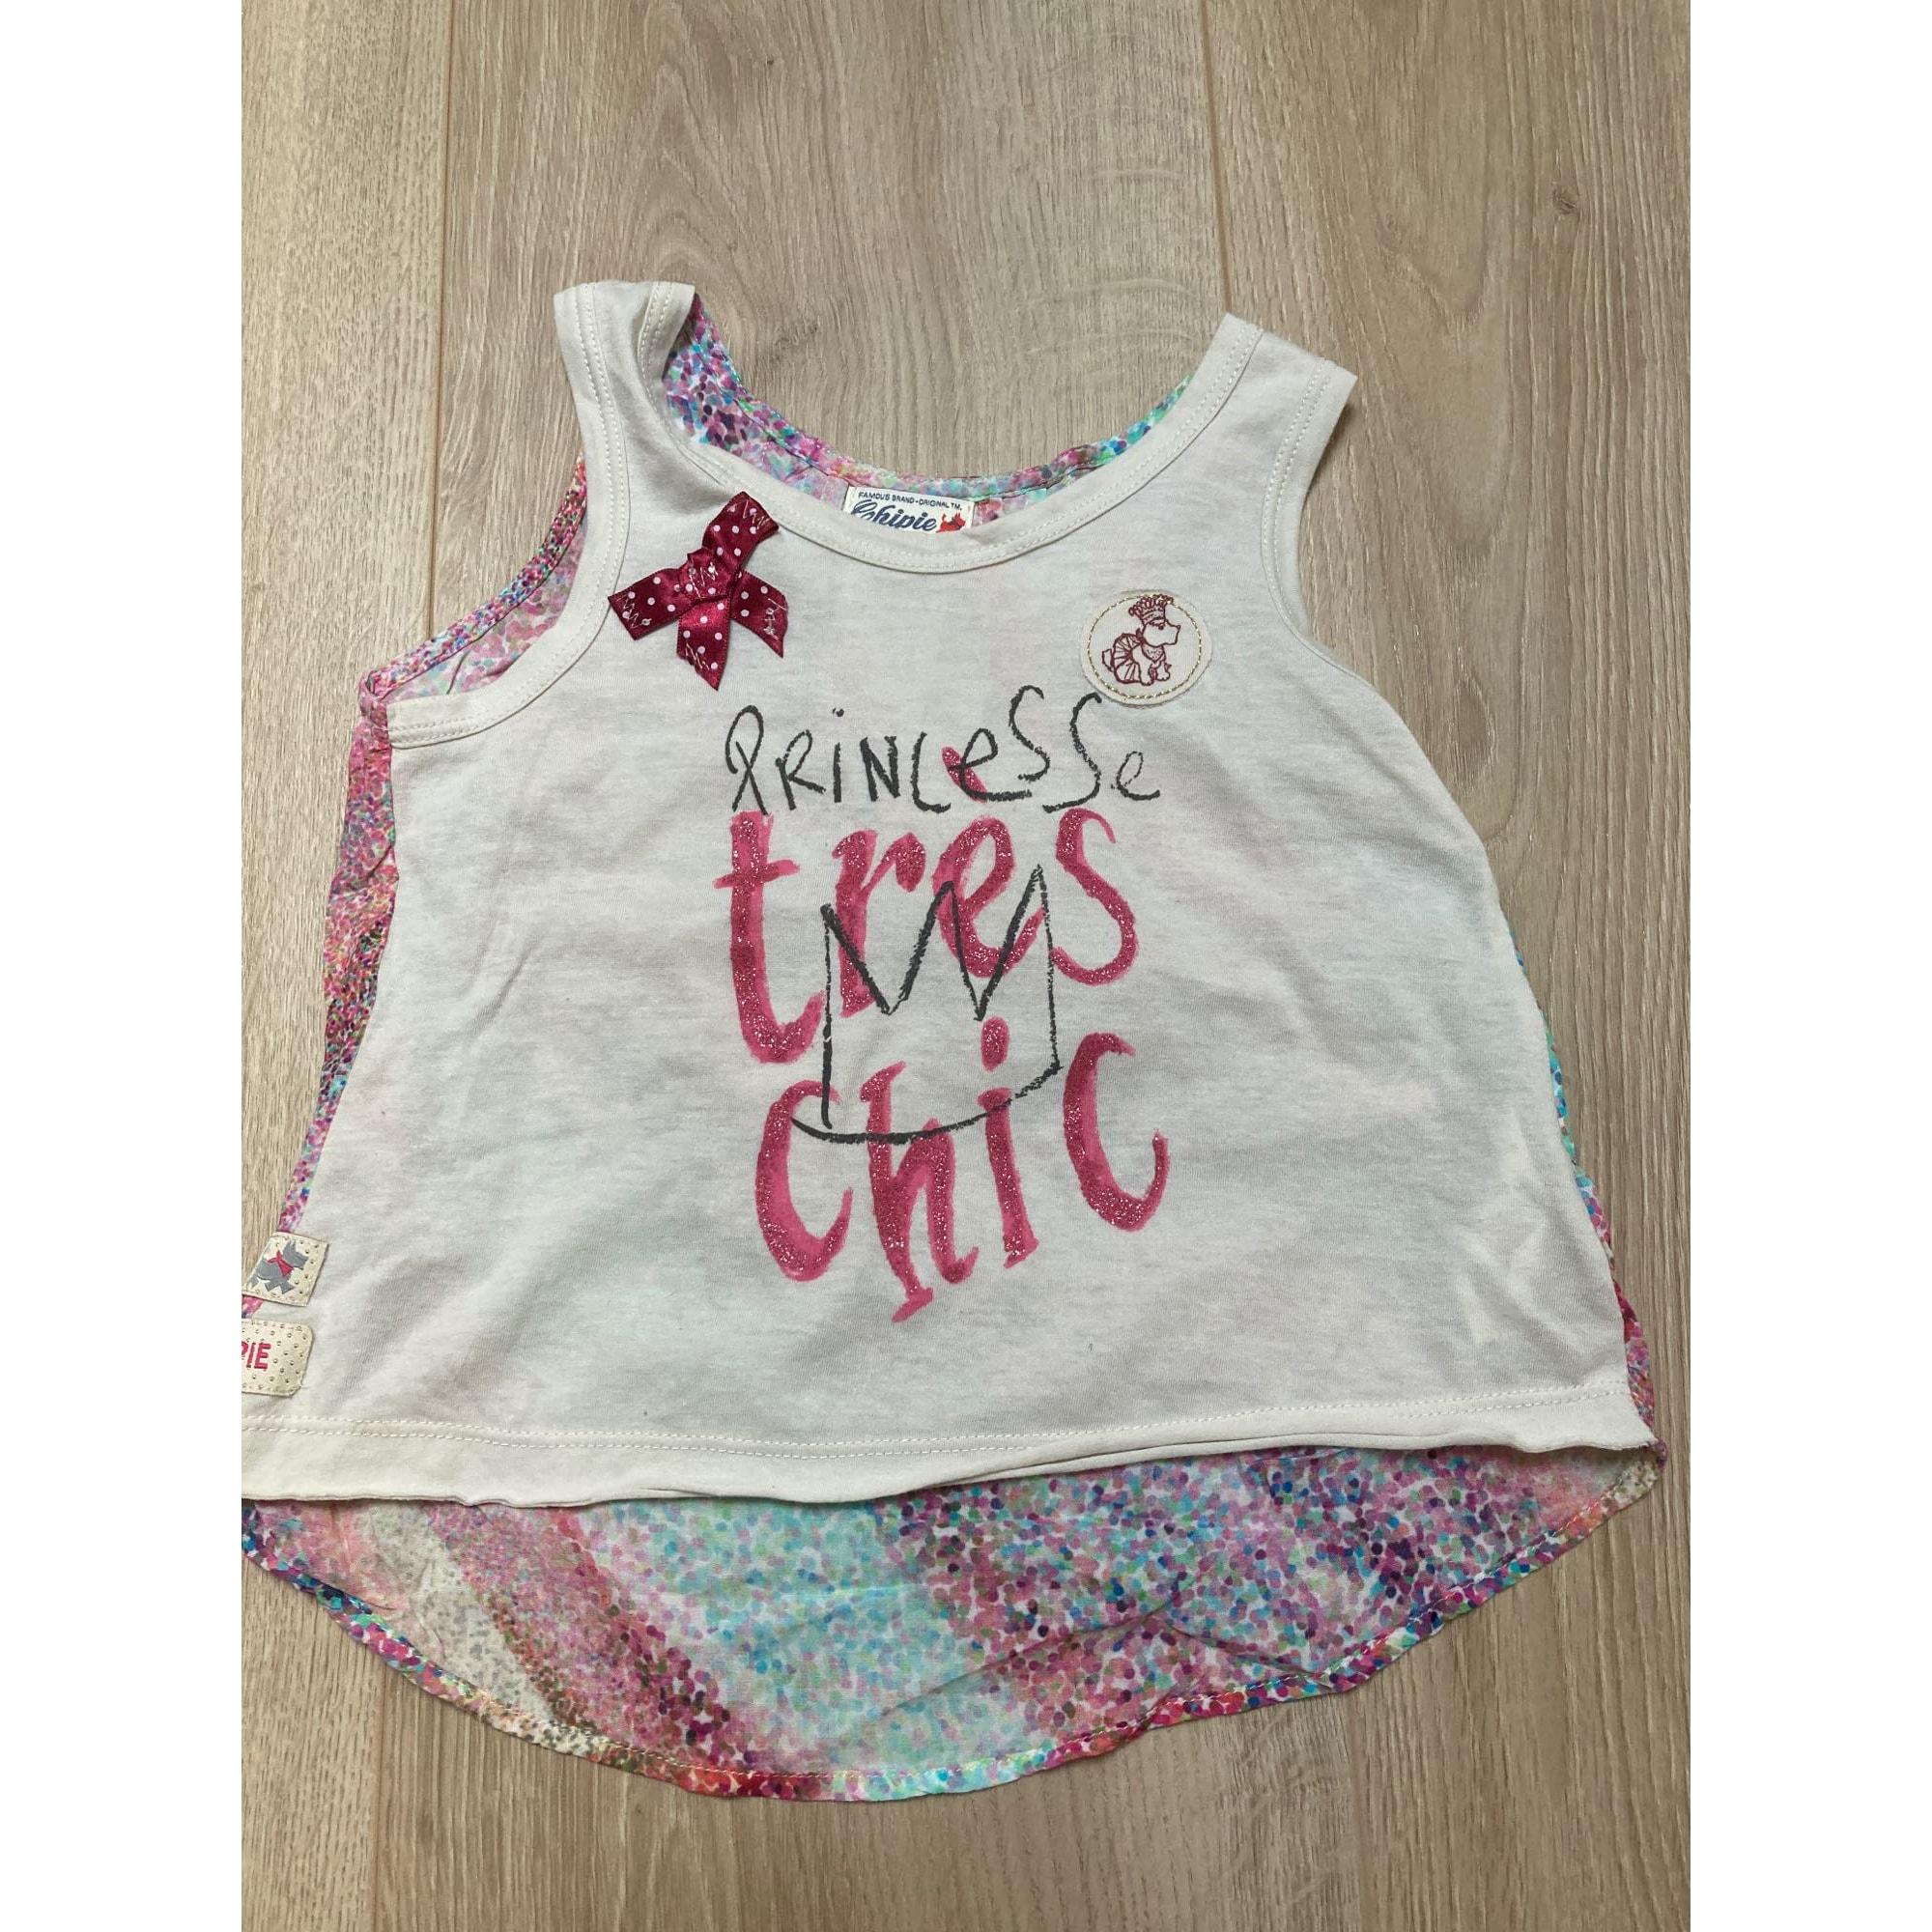 Top, Tee-shirt CHIPIE Multicouleur